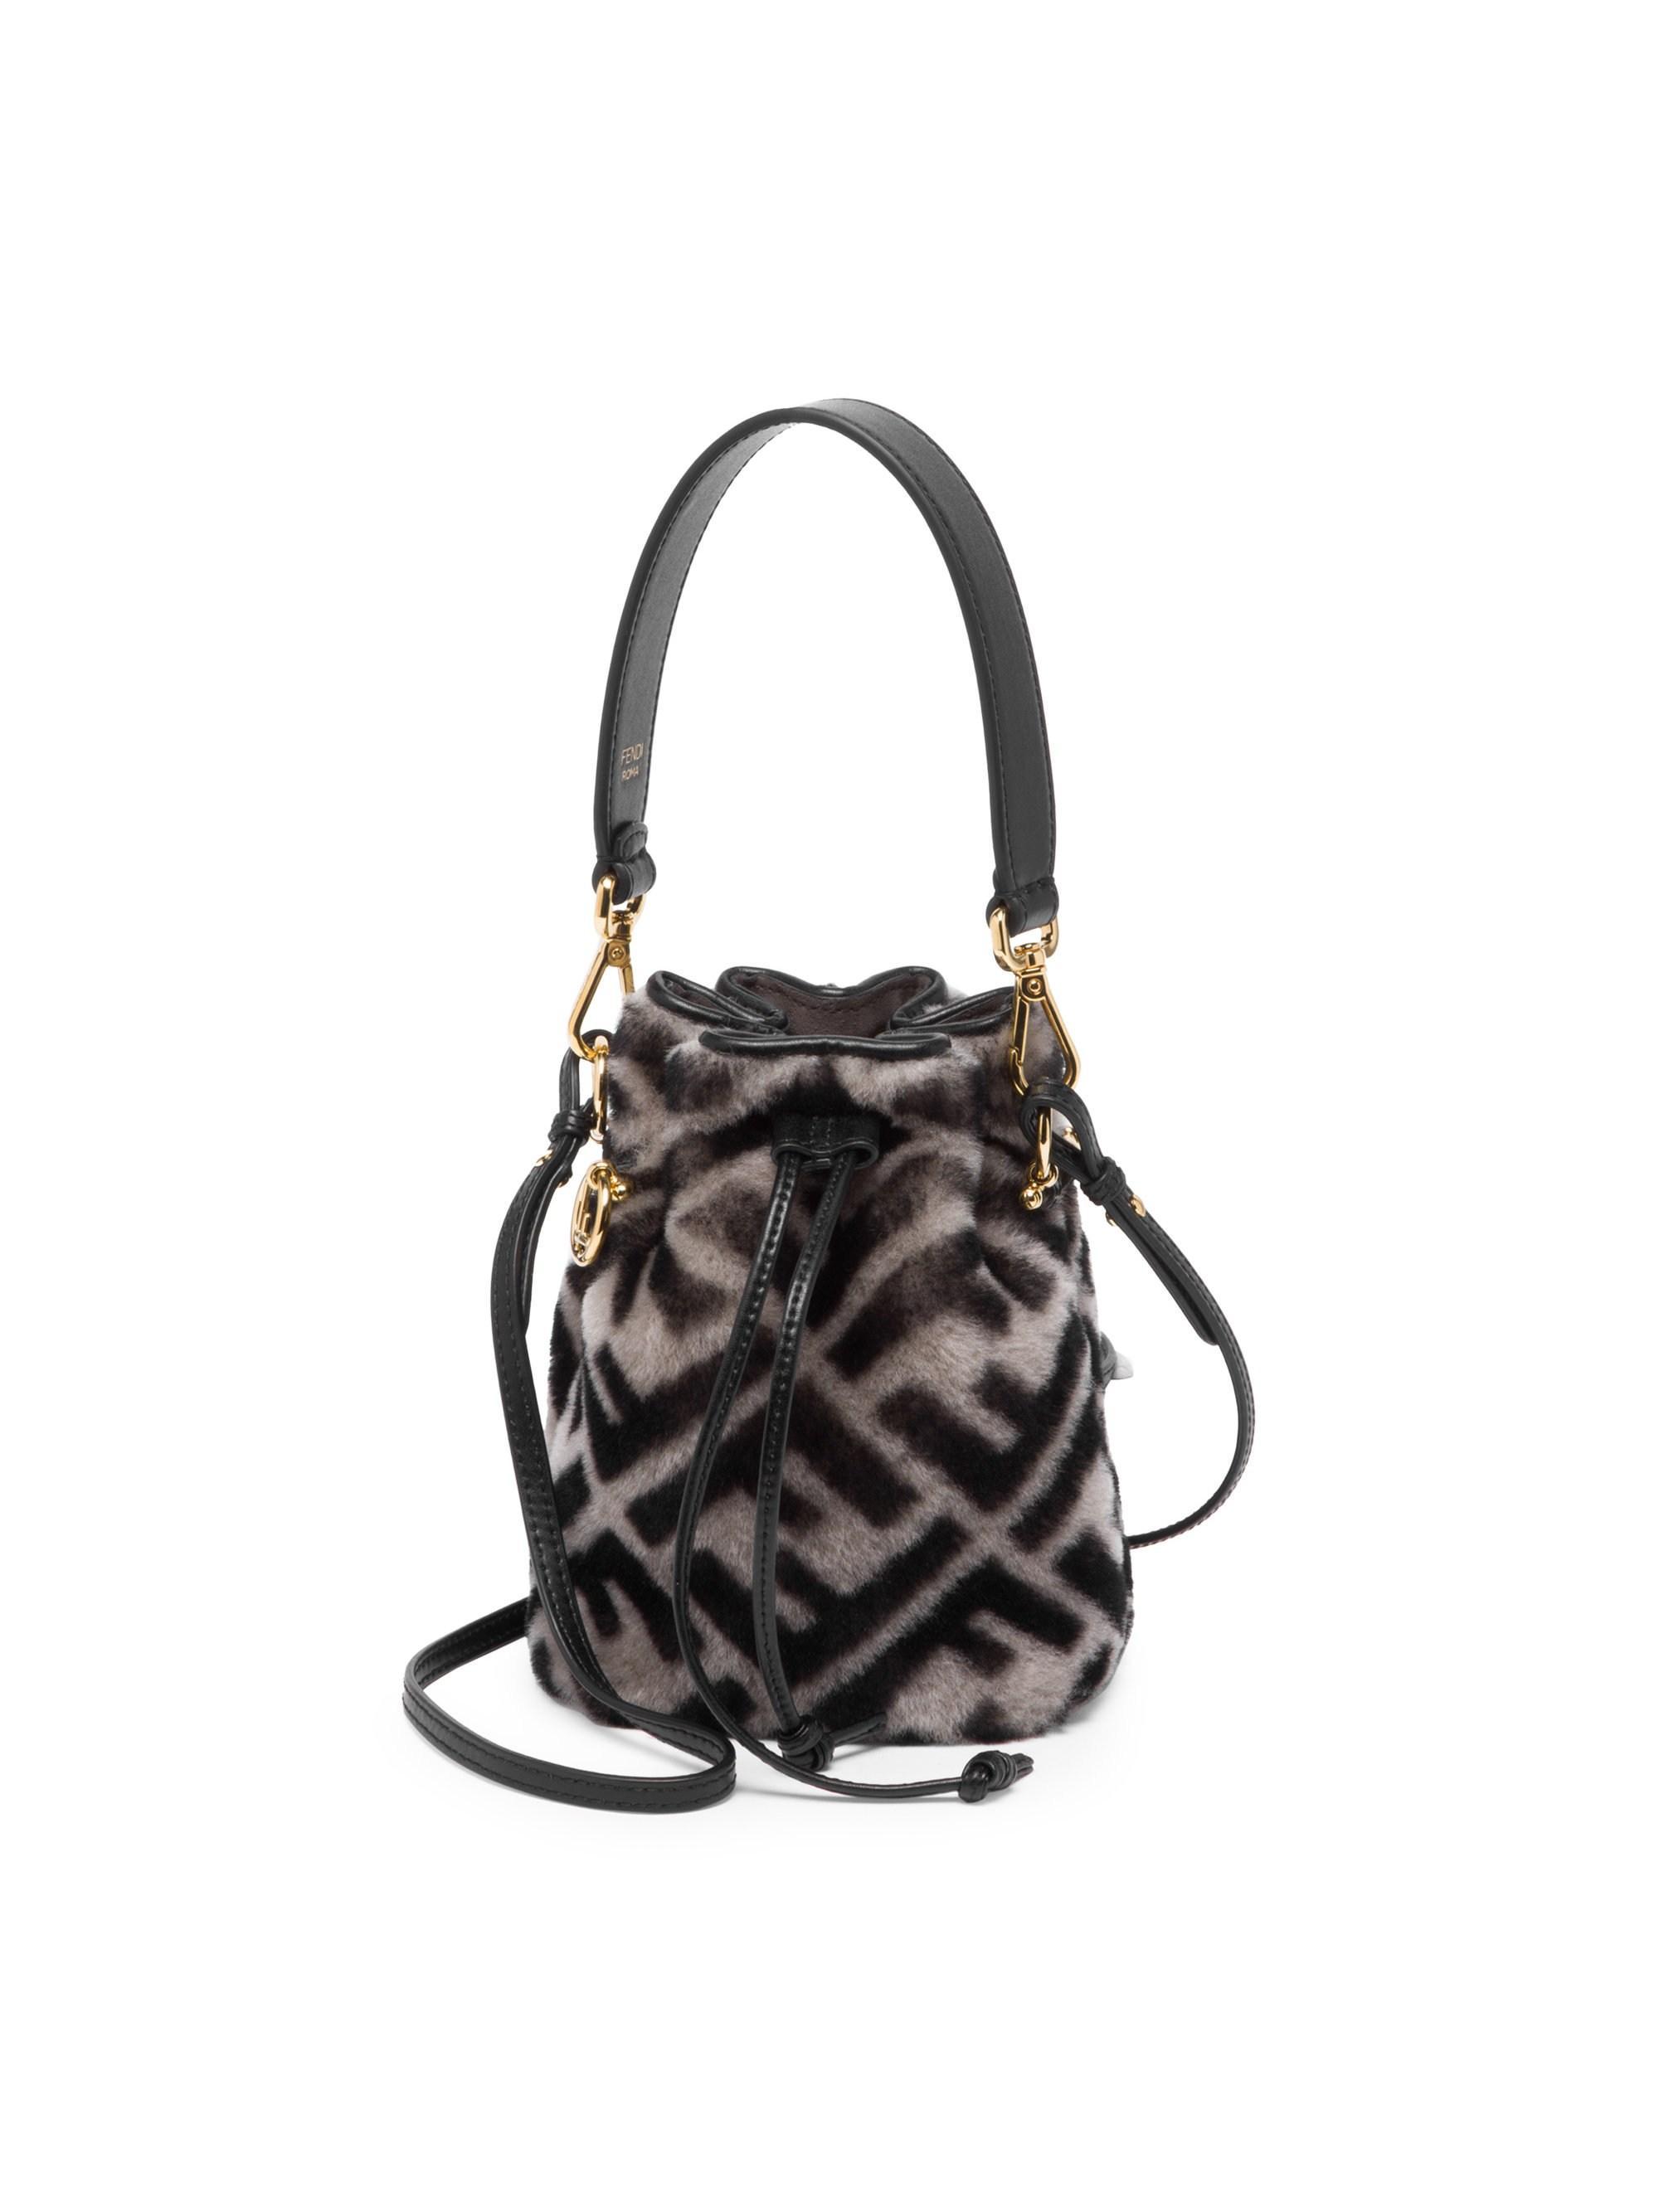 Fendi Mini Mon Tresor Shearling Bucket Bag in Black - Lyst 8c856313de784